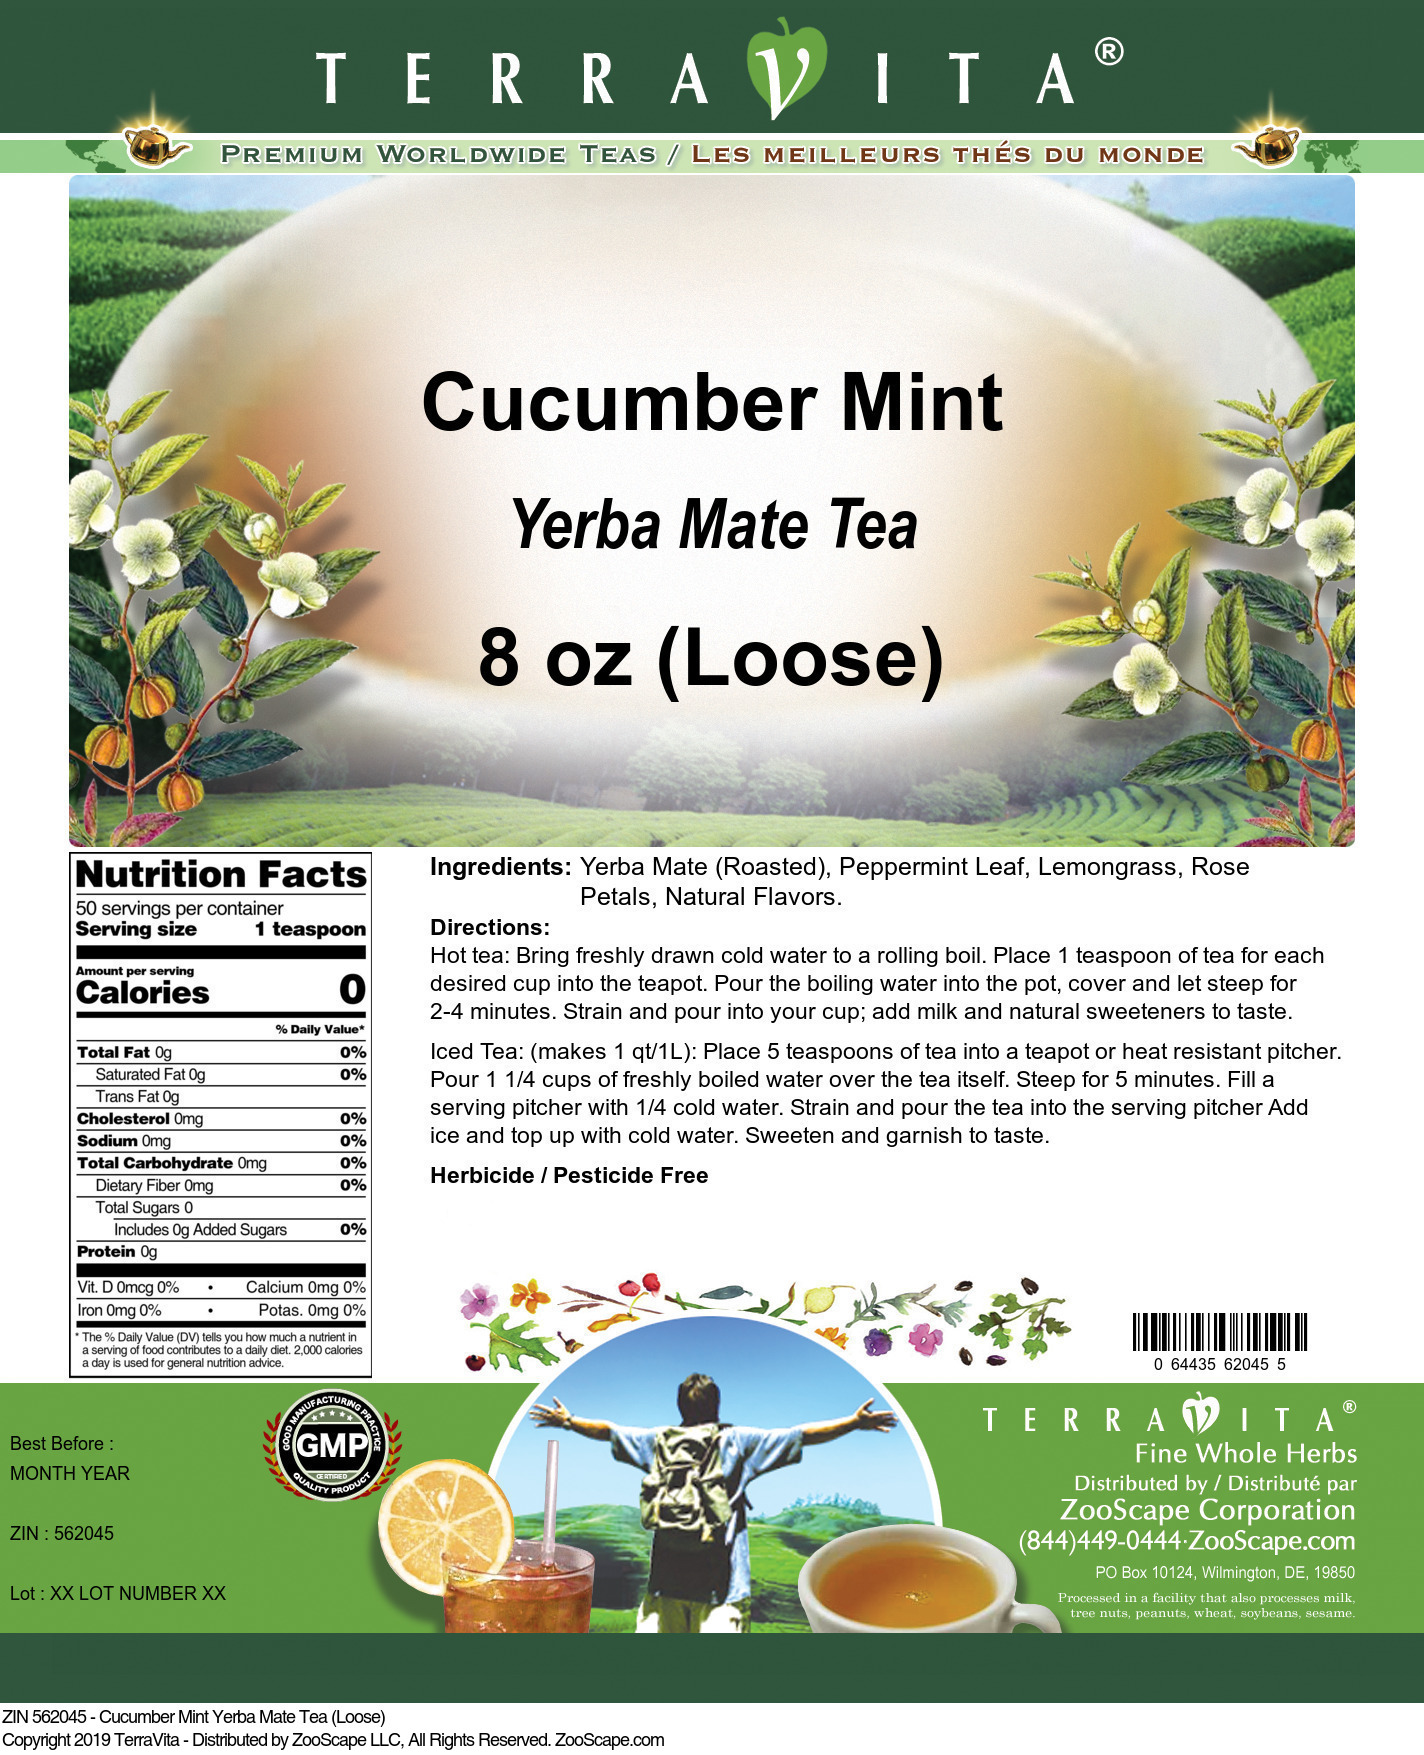 Cucumber Mint Yerba Mate Tea (Loose)